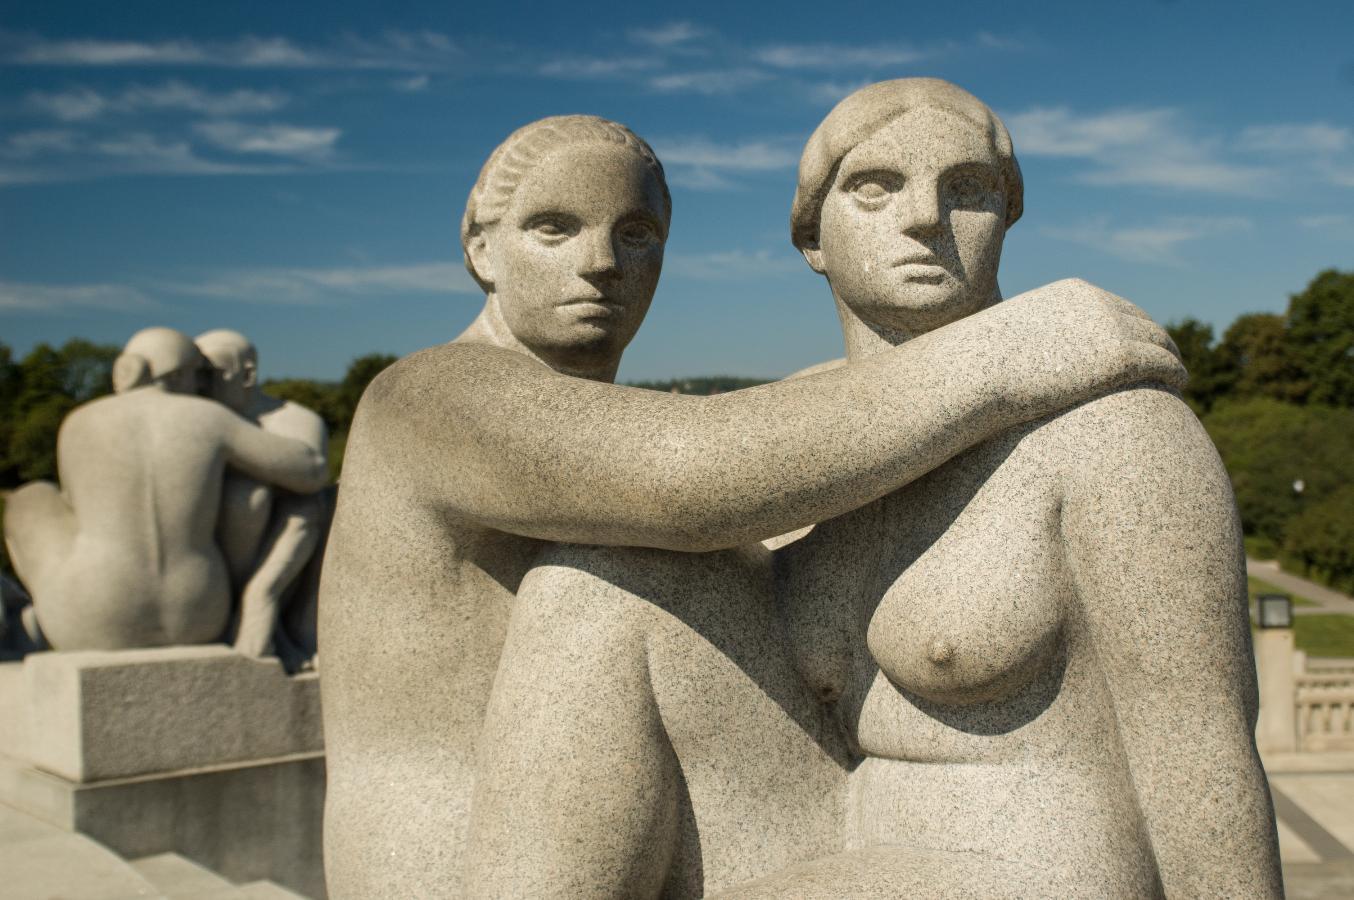 vigeland-park-oslo-norway-2006